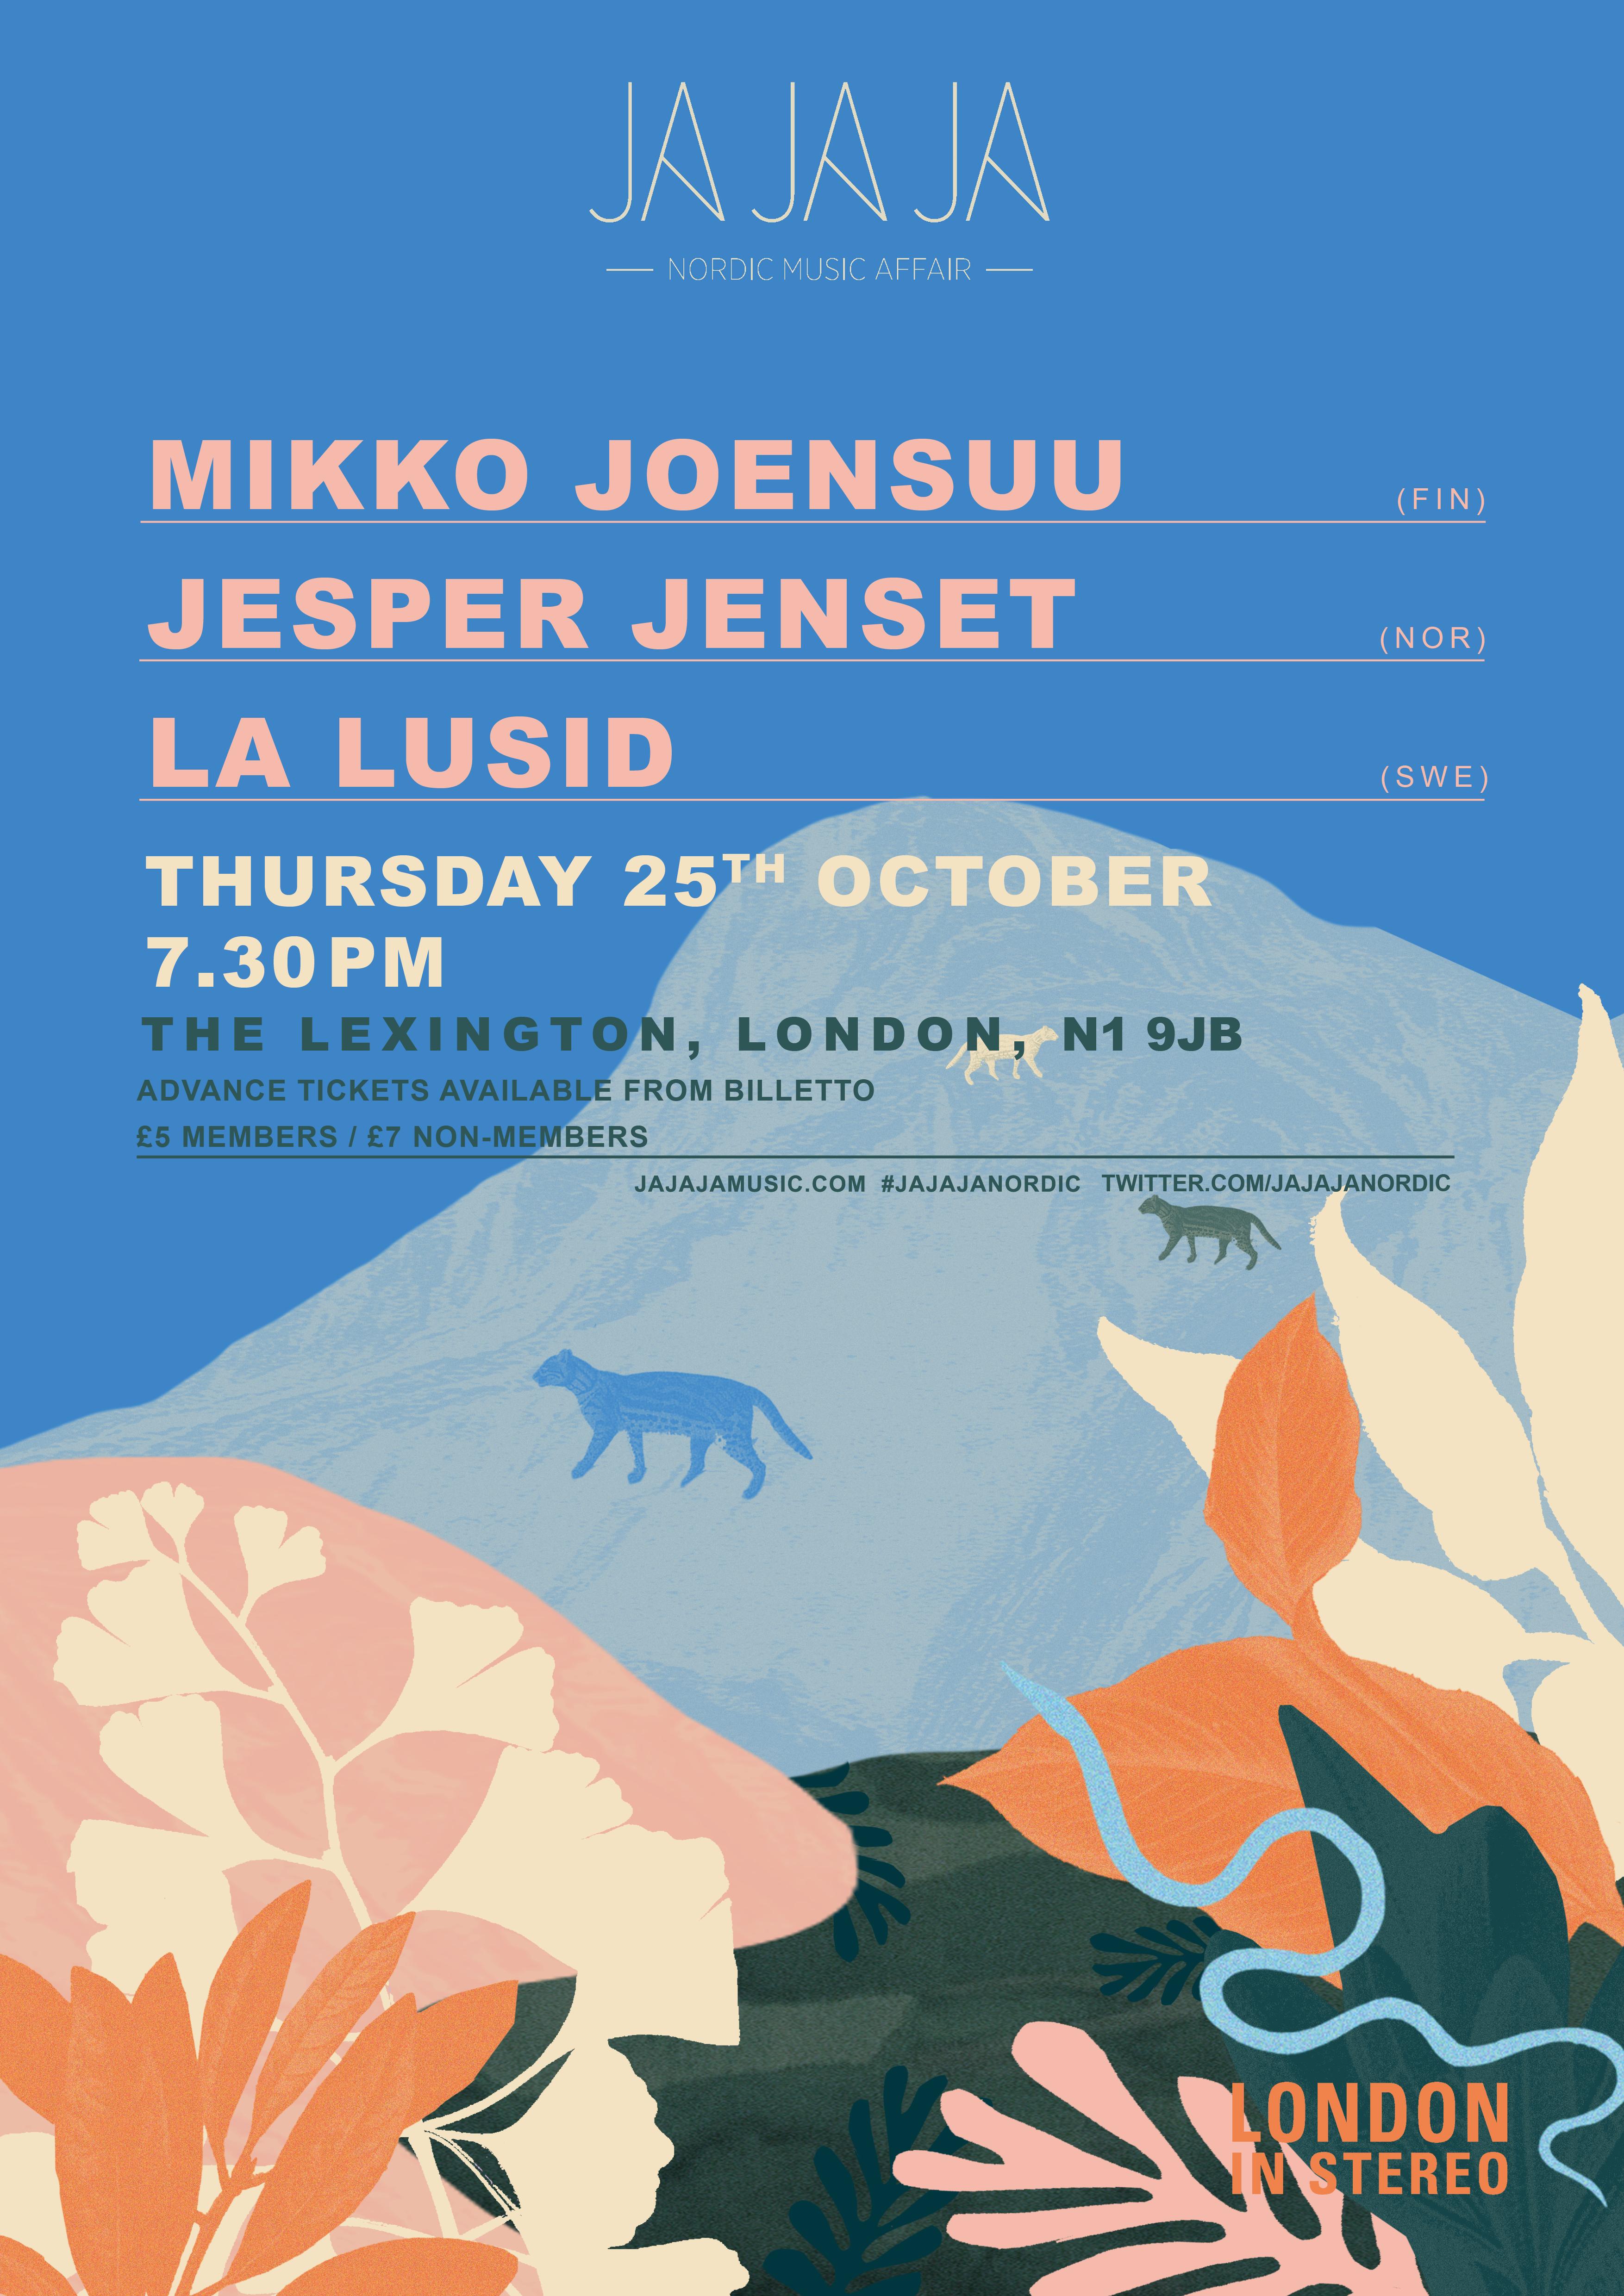 Ja Ja Ja London: October 2018 with Mikko Joensuu, Jesper Jenset + La